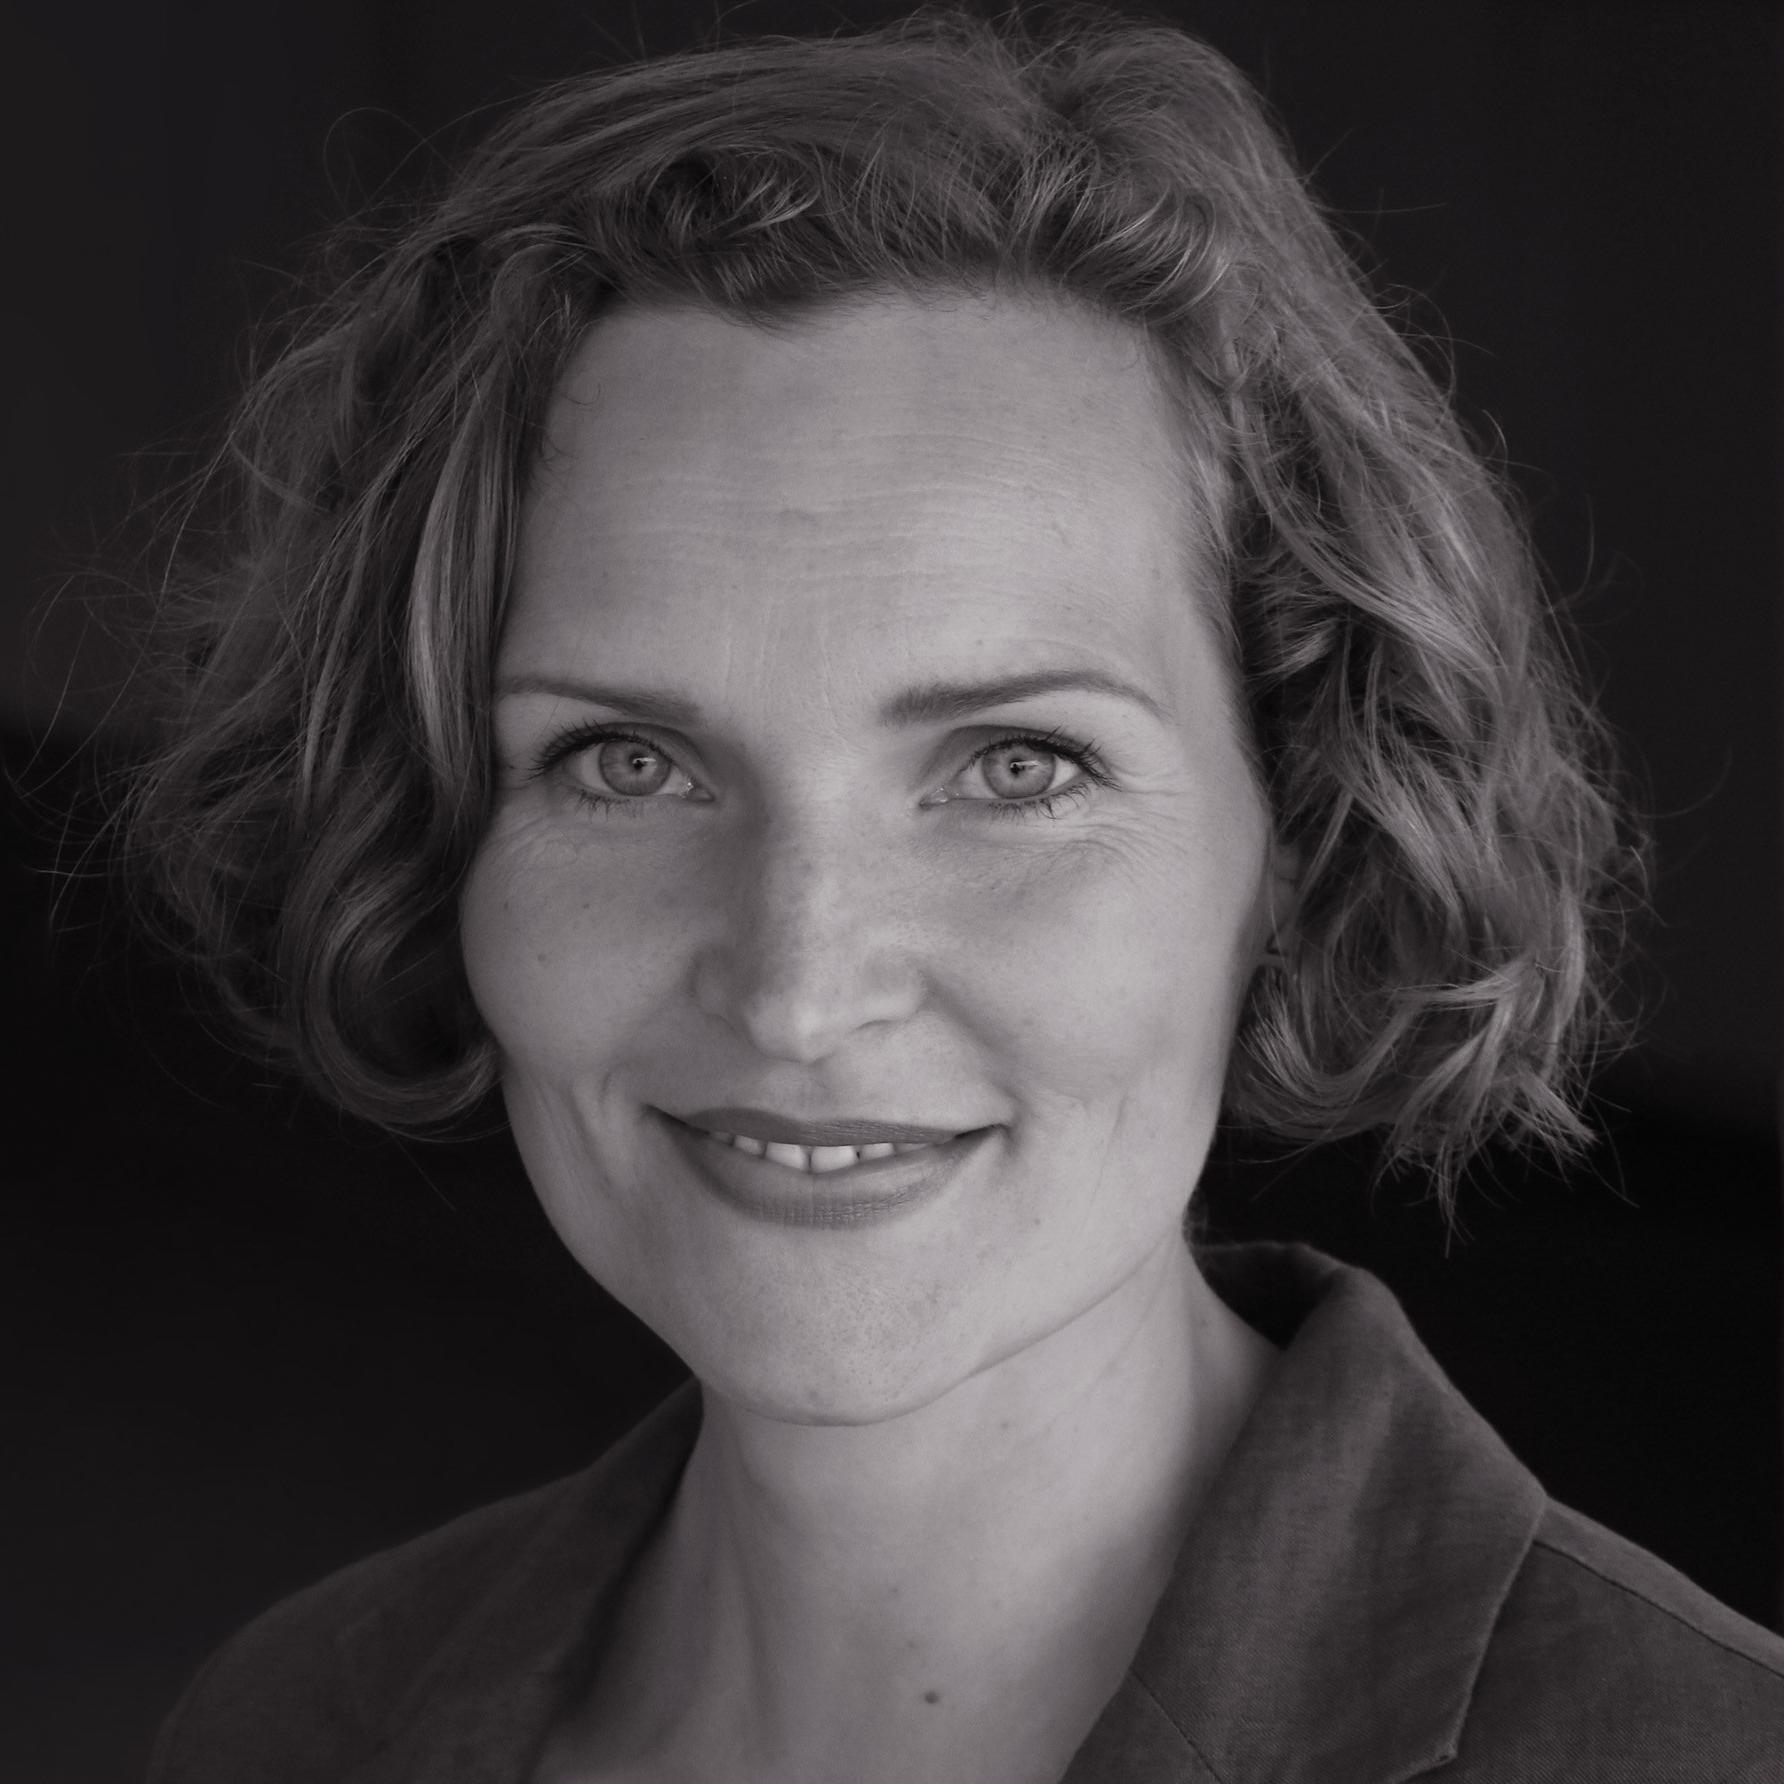 Stefanie Bruns